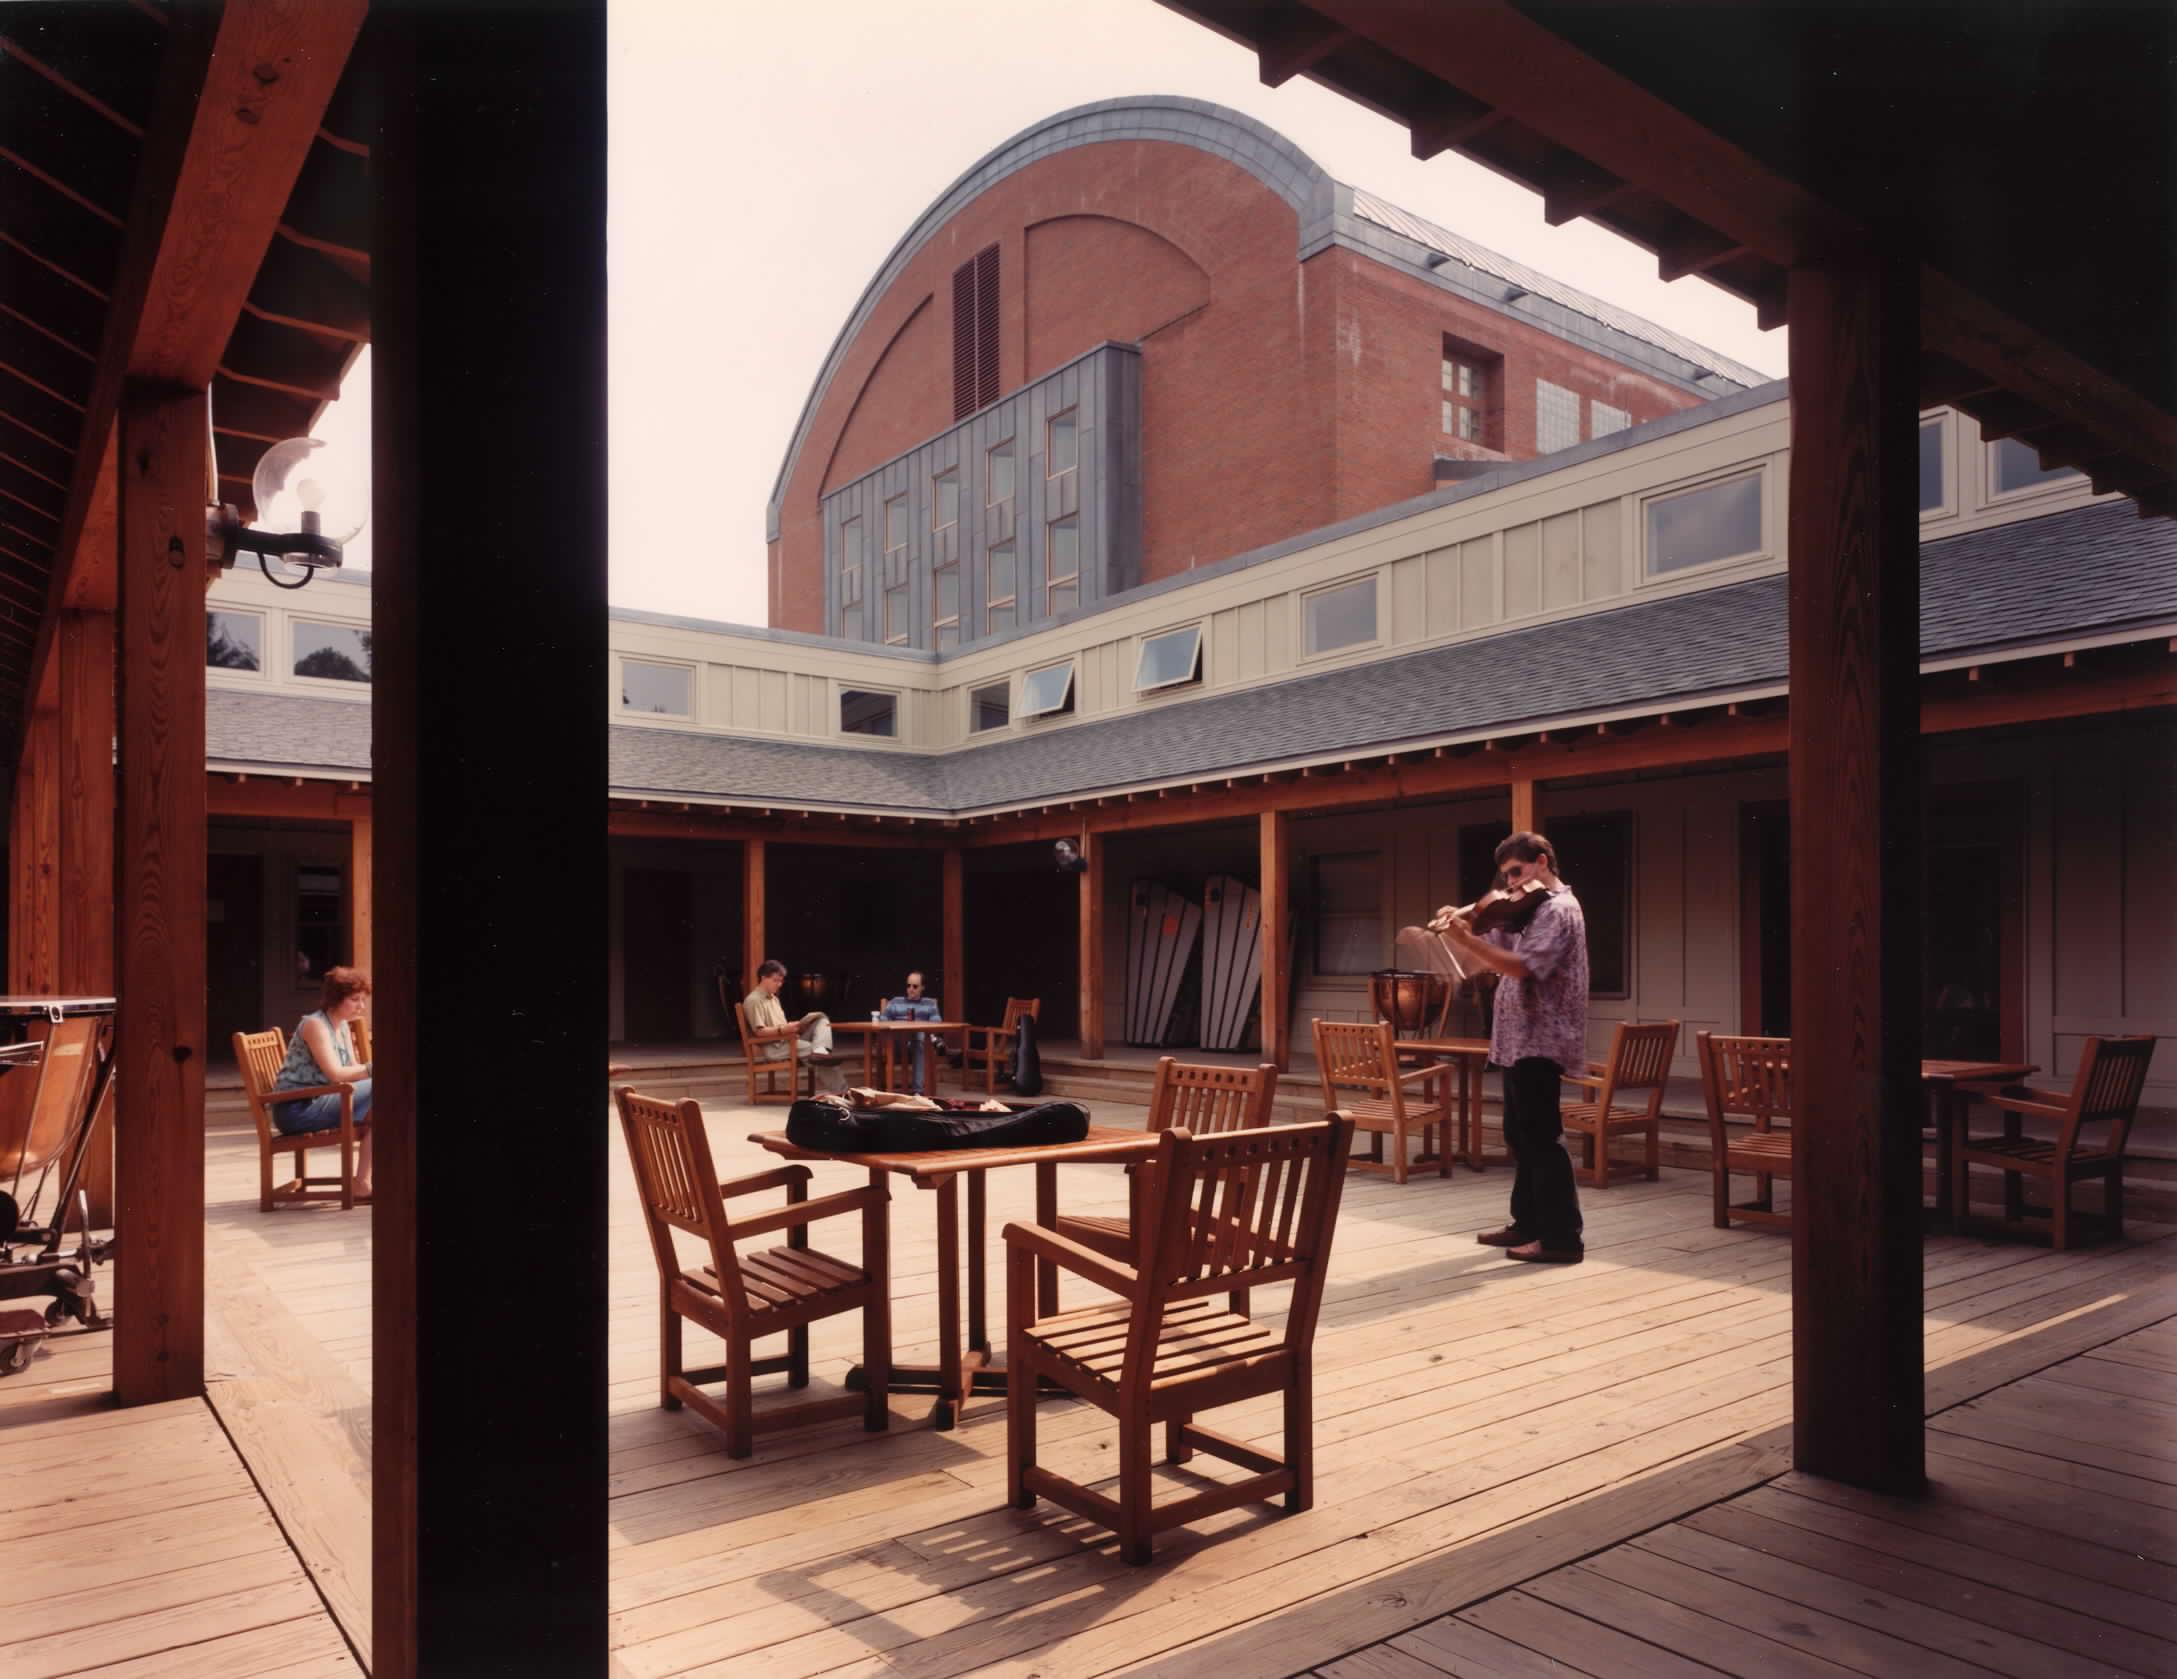 Tanglewood-Ozawa-Hall-Alan-Joslin-13.jpg